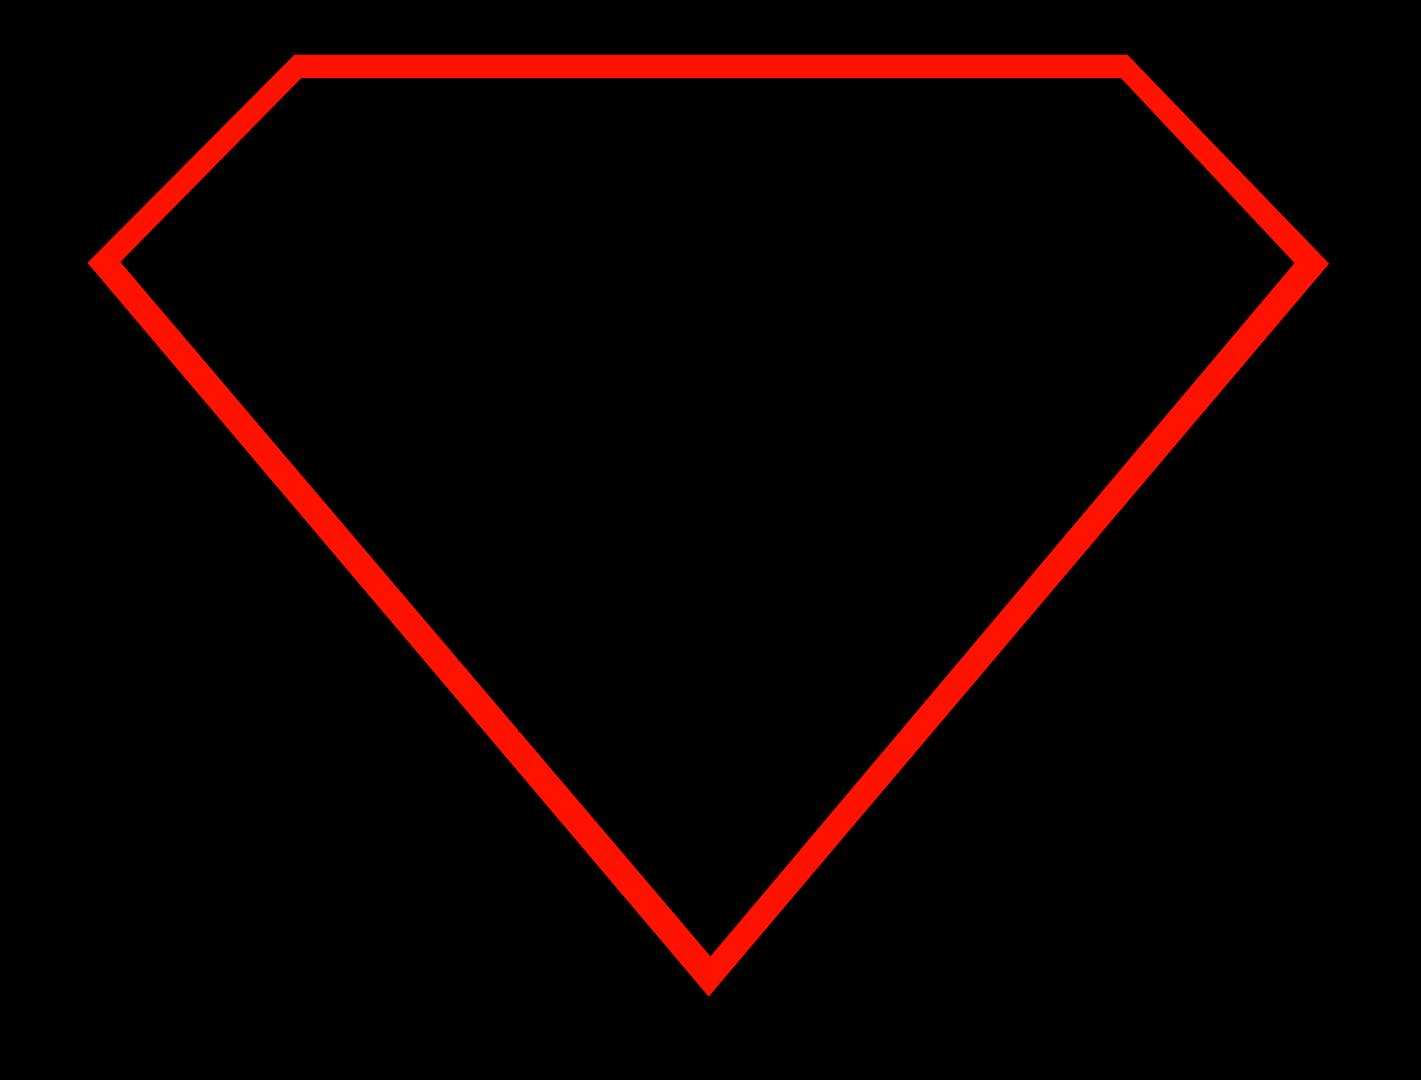 pin superman logo outline on clipart panda free clipart images rh clipartpanda com superman logo outline clip art superman logo outline vector